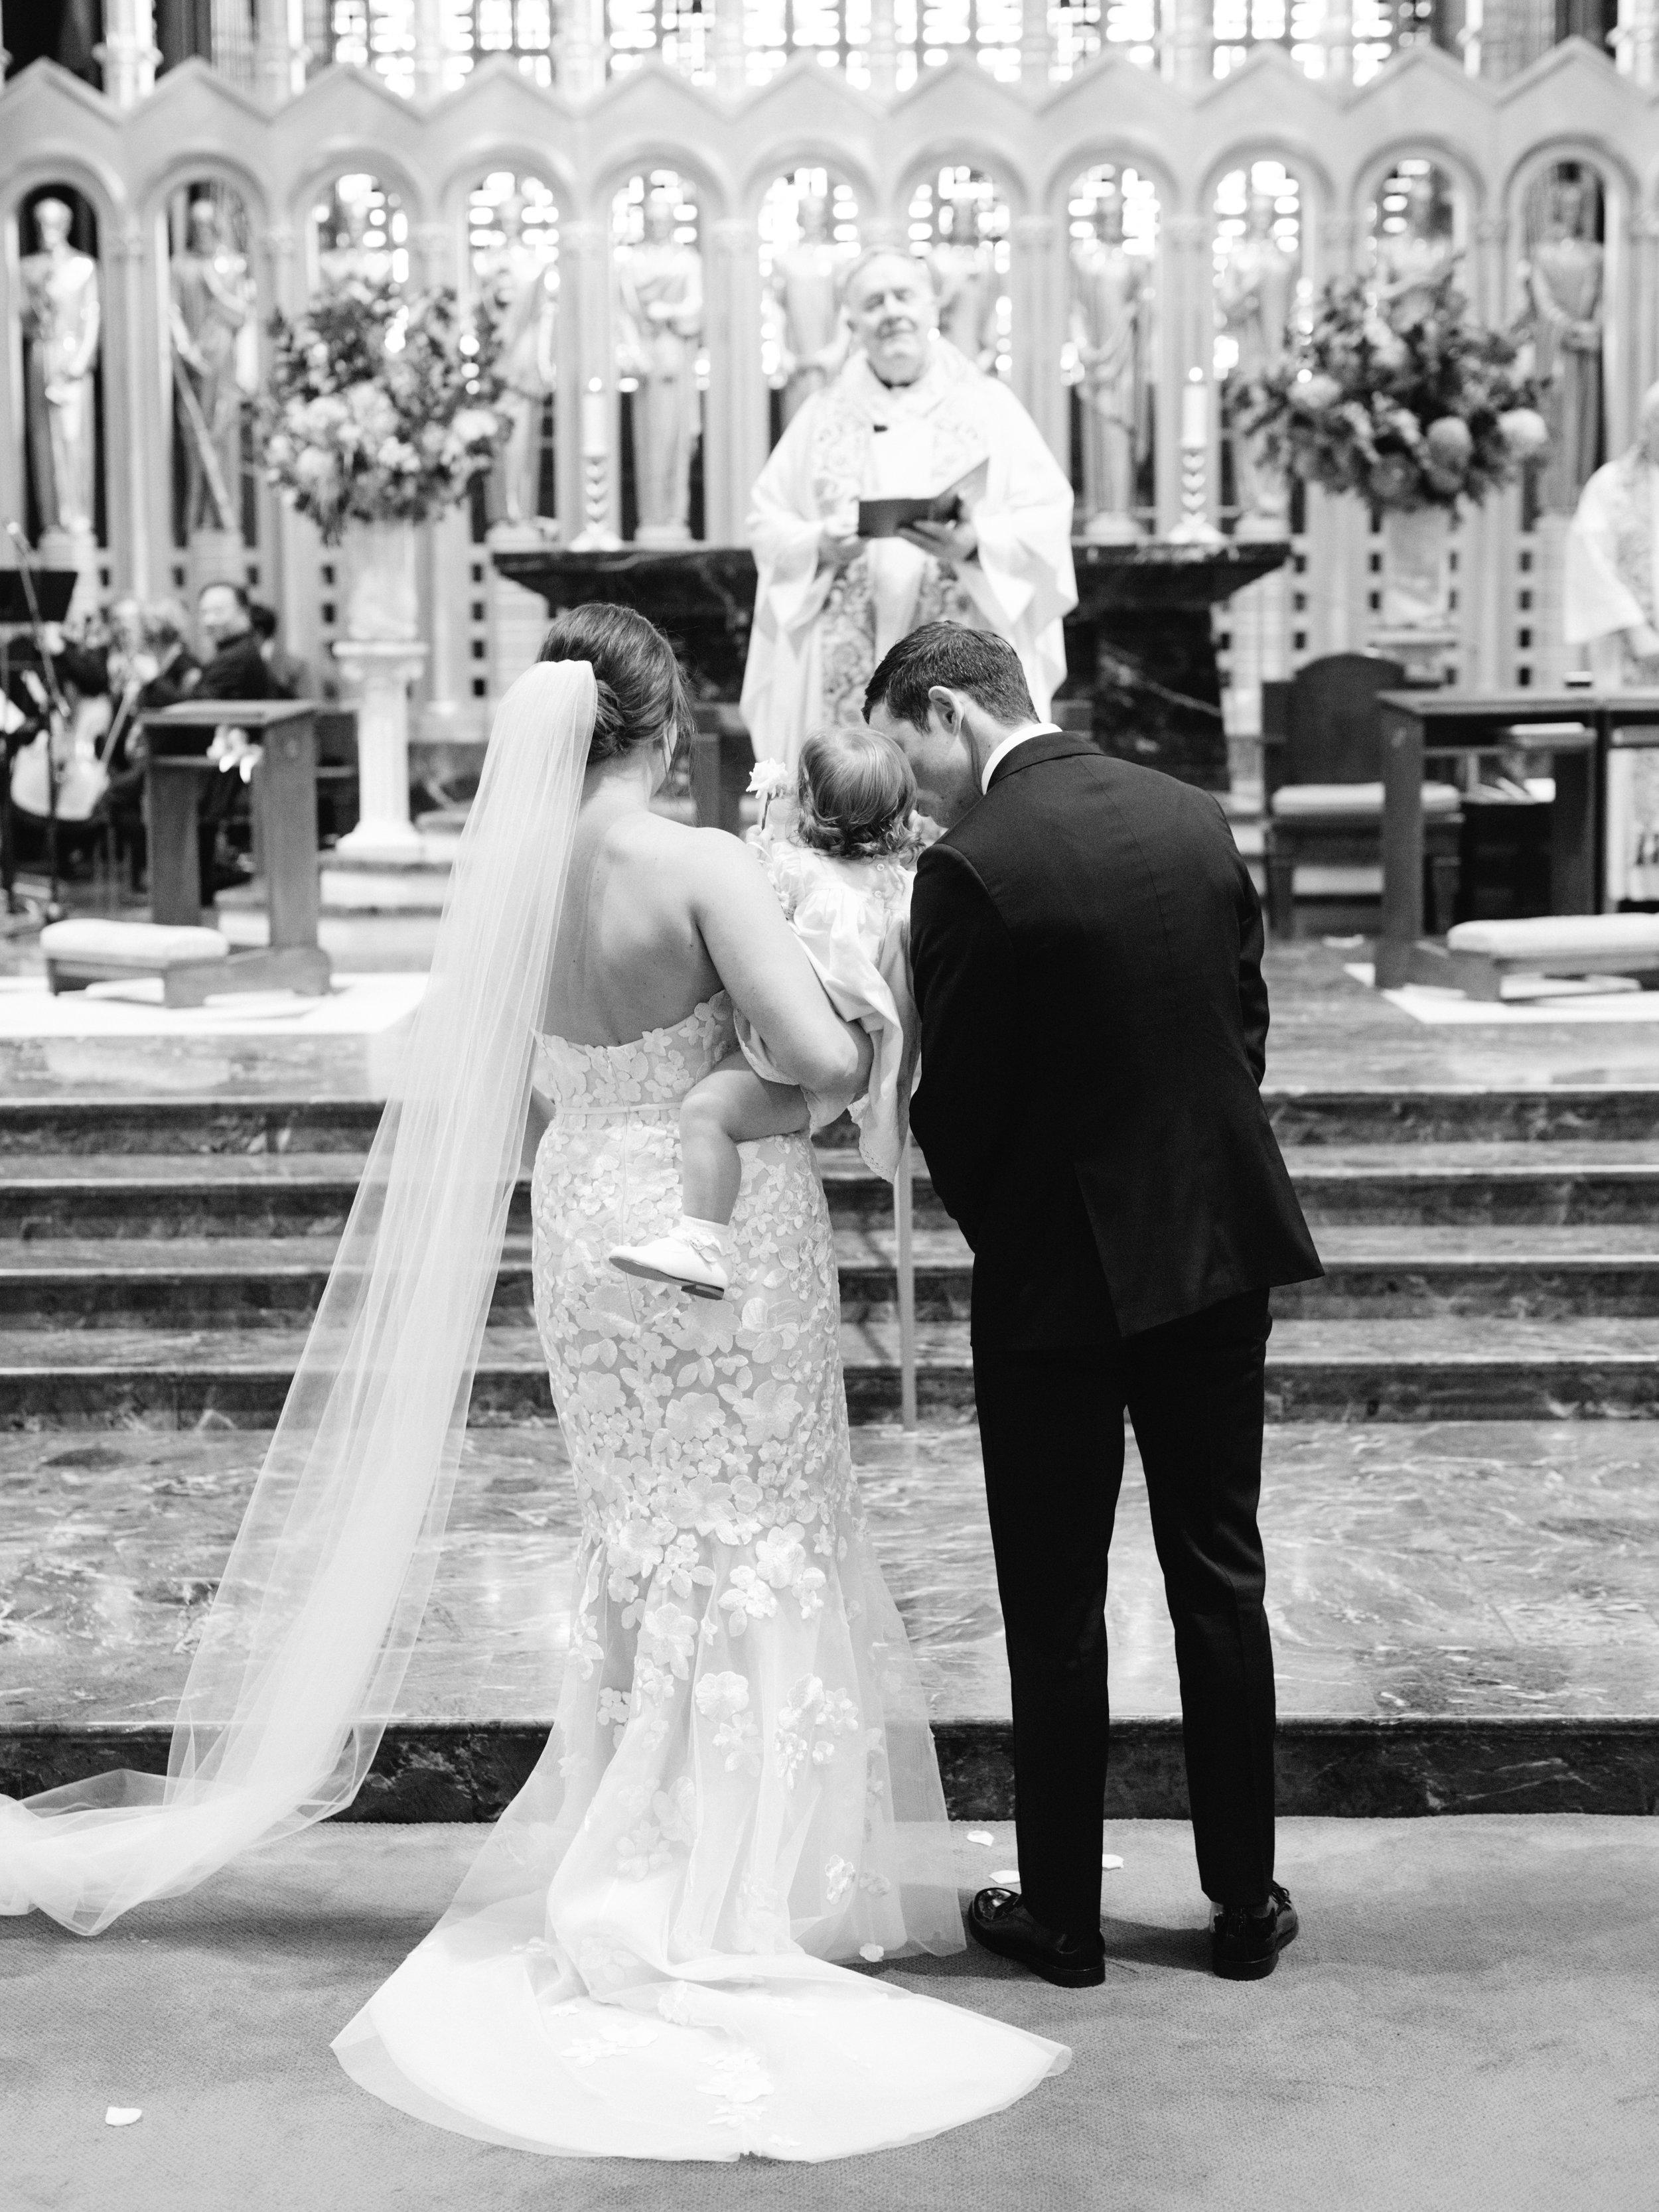 Kyle John l Fine Art Wedding Photography l Chicago, Copenhagen, California, New York, Destination l Blog l Kate and Michael_Winnetka_18